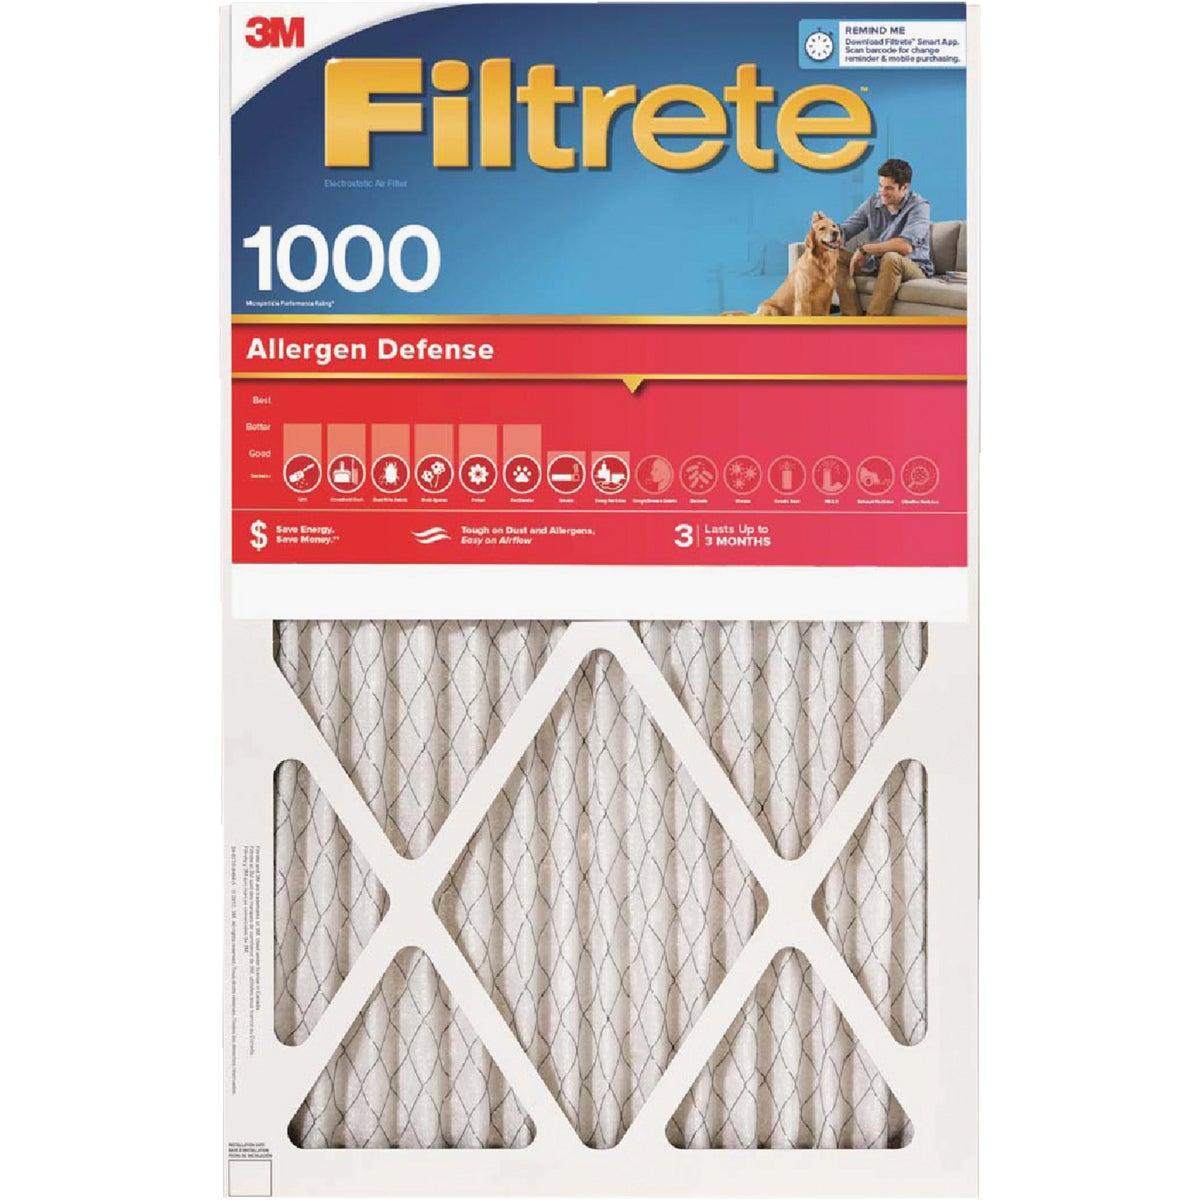 3M Filtrete 12 In. x 24 In. x 1 In. Allergen Defense 1000/1085 MPR Furnace Filter